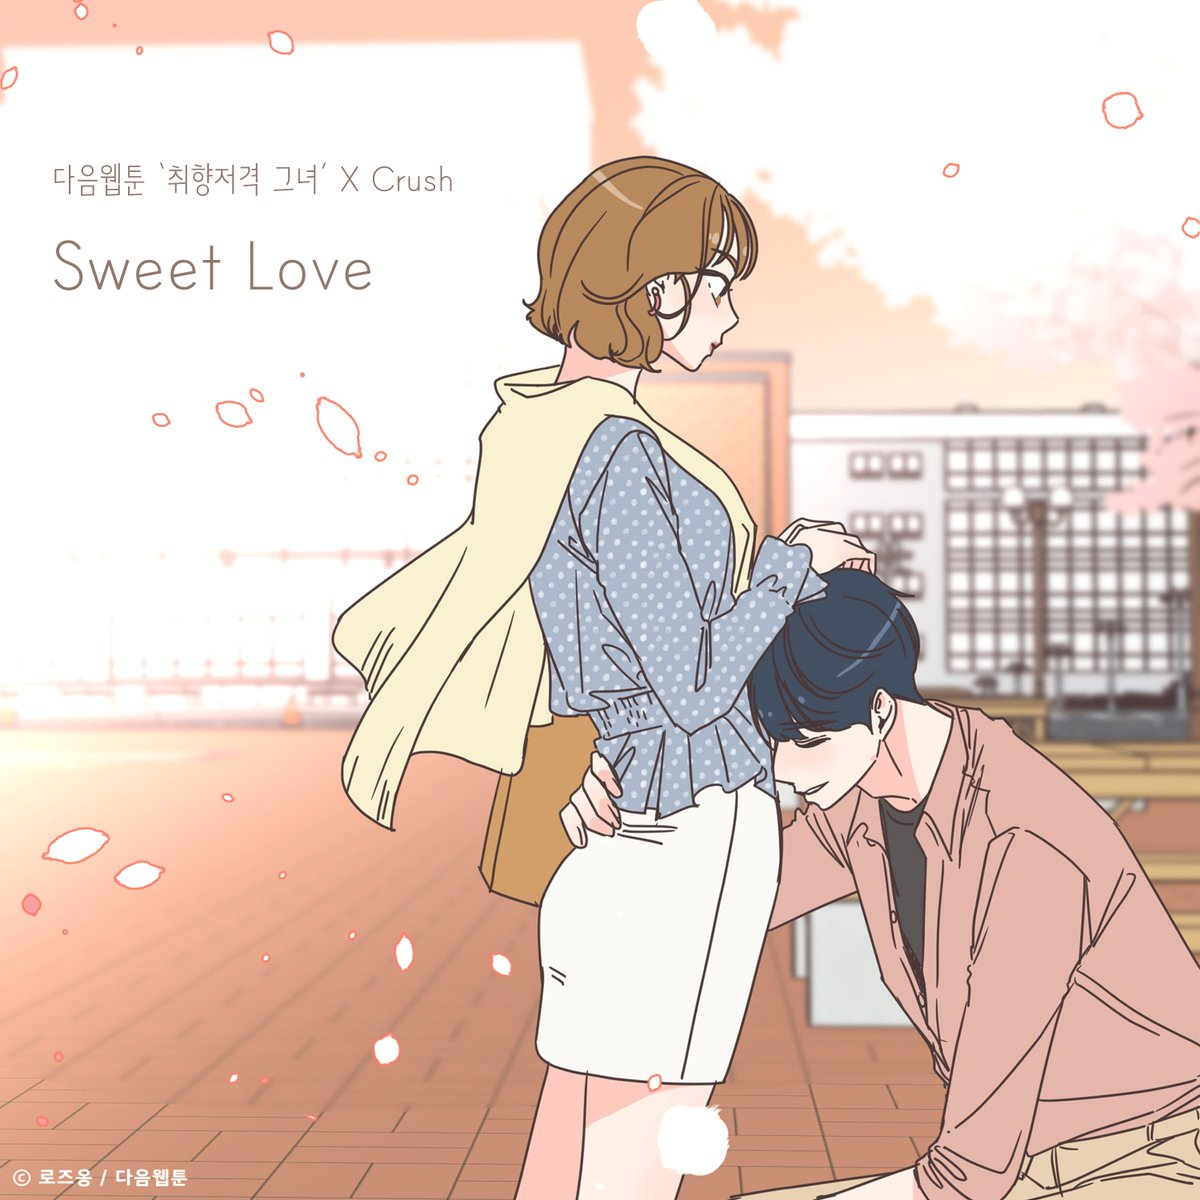 [Crush]   취향저격 그녀 OST 'Sweet Love' 발매 She is My Type♡ OST 'Sweet Love' OUT NOW ⠀ @crush9244 from @OfficialPnation  ⠀ #Crush #크러쉬 #PNATION #피네이션 #취향저격그녀 #SheisMyType #SweetLove https://t.co/uYlFnc9hUC